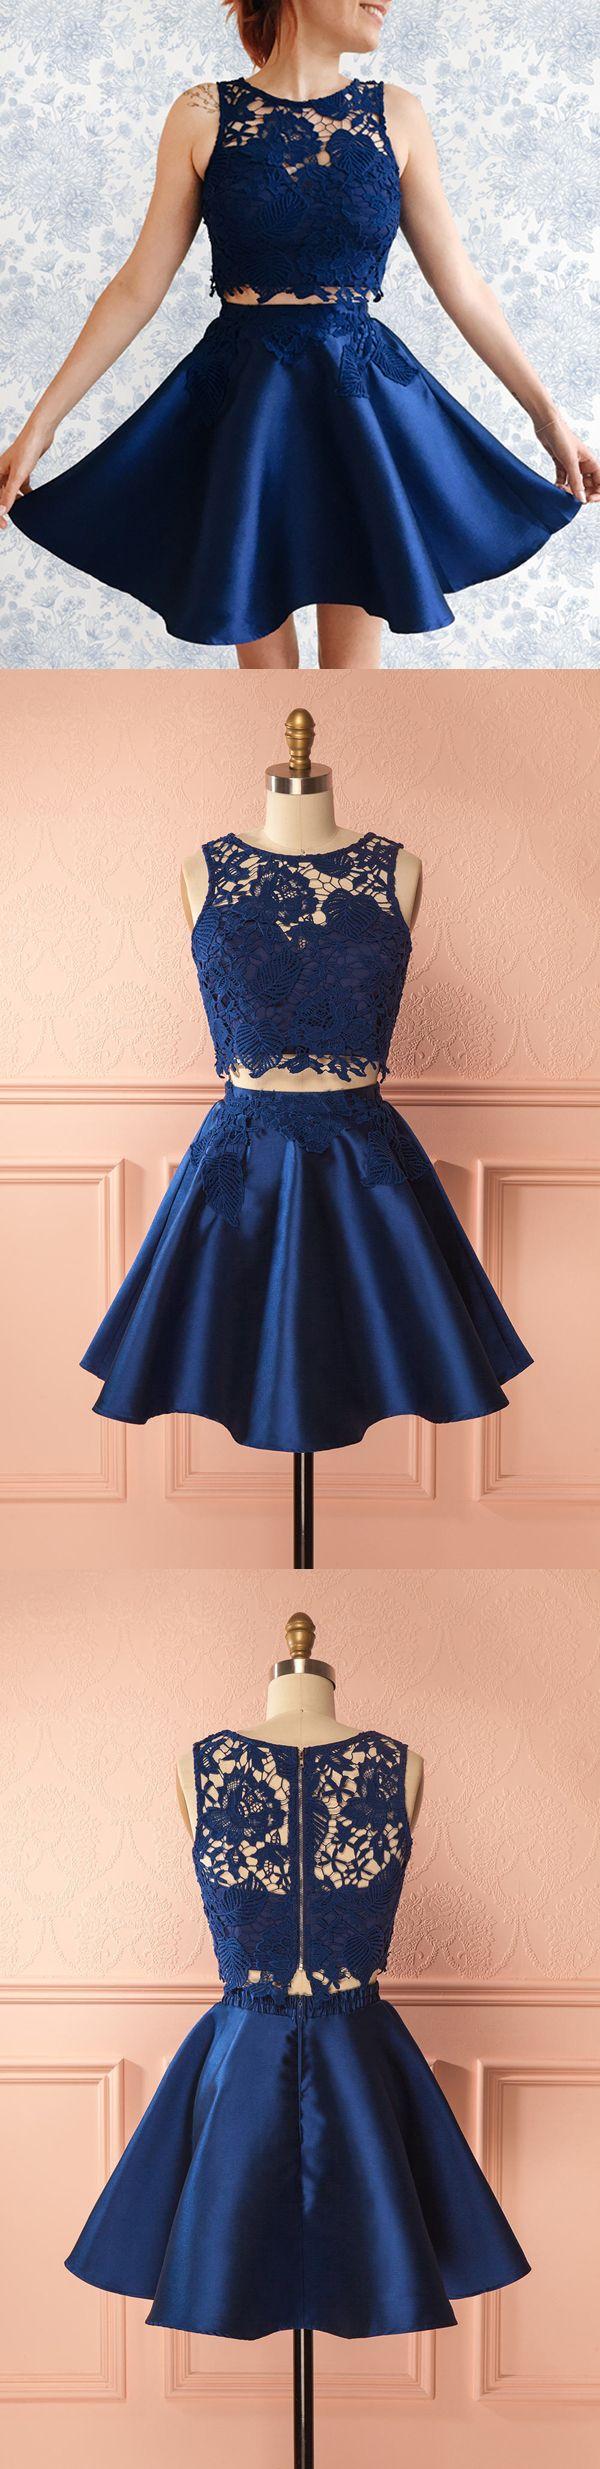 homecoming dresses,short homecoming dresses,cheap homecoming dresses,lace homecoming dresses,two piece homecoming dresses